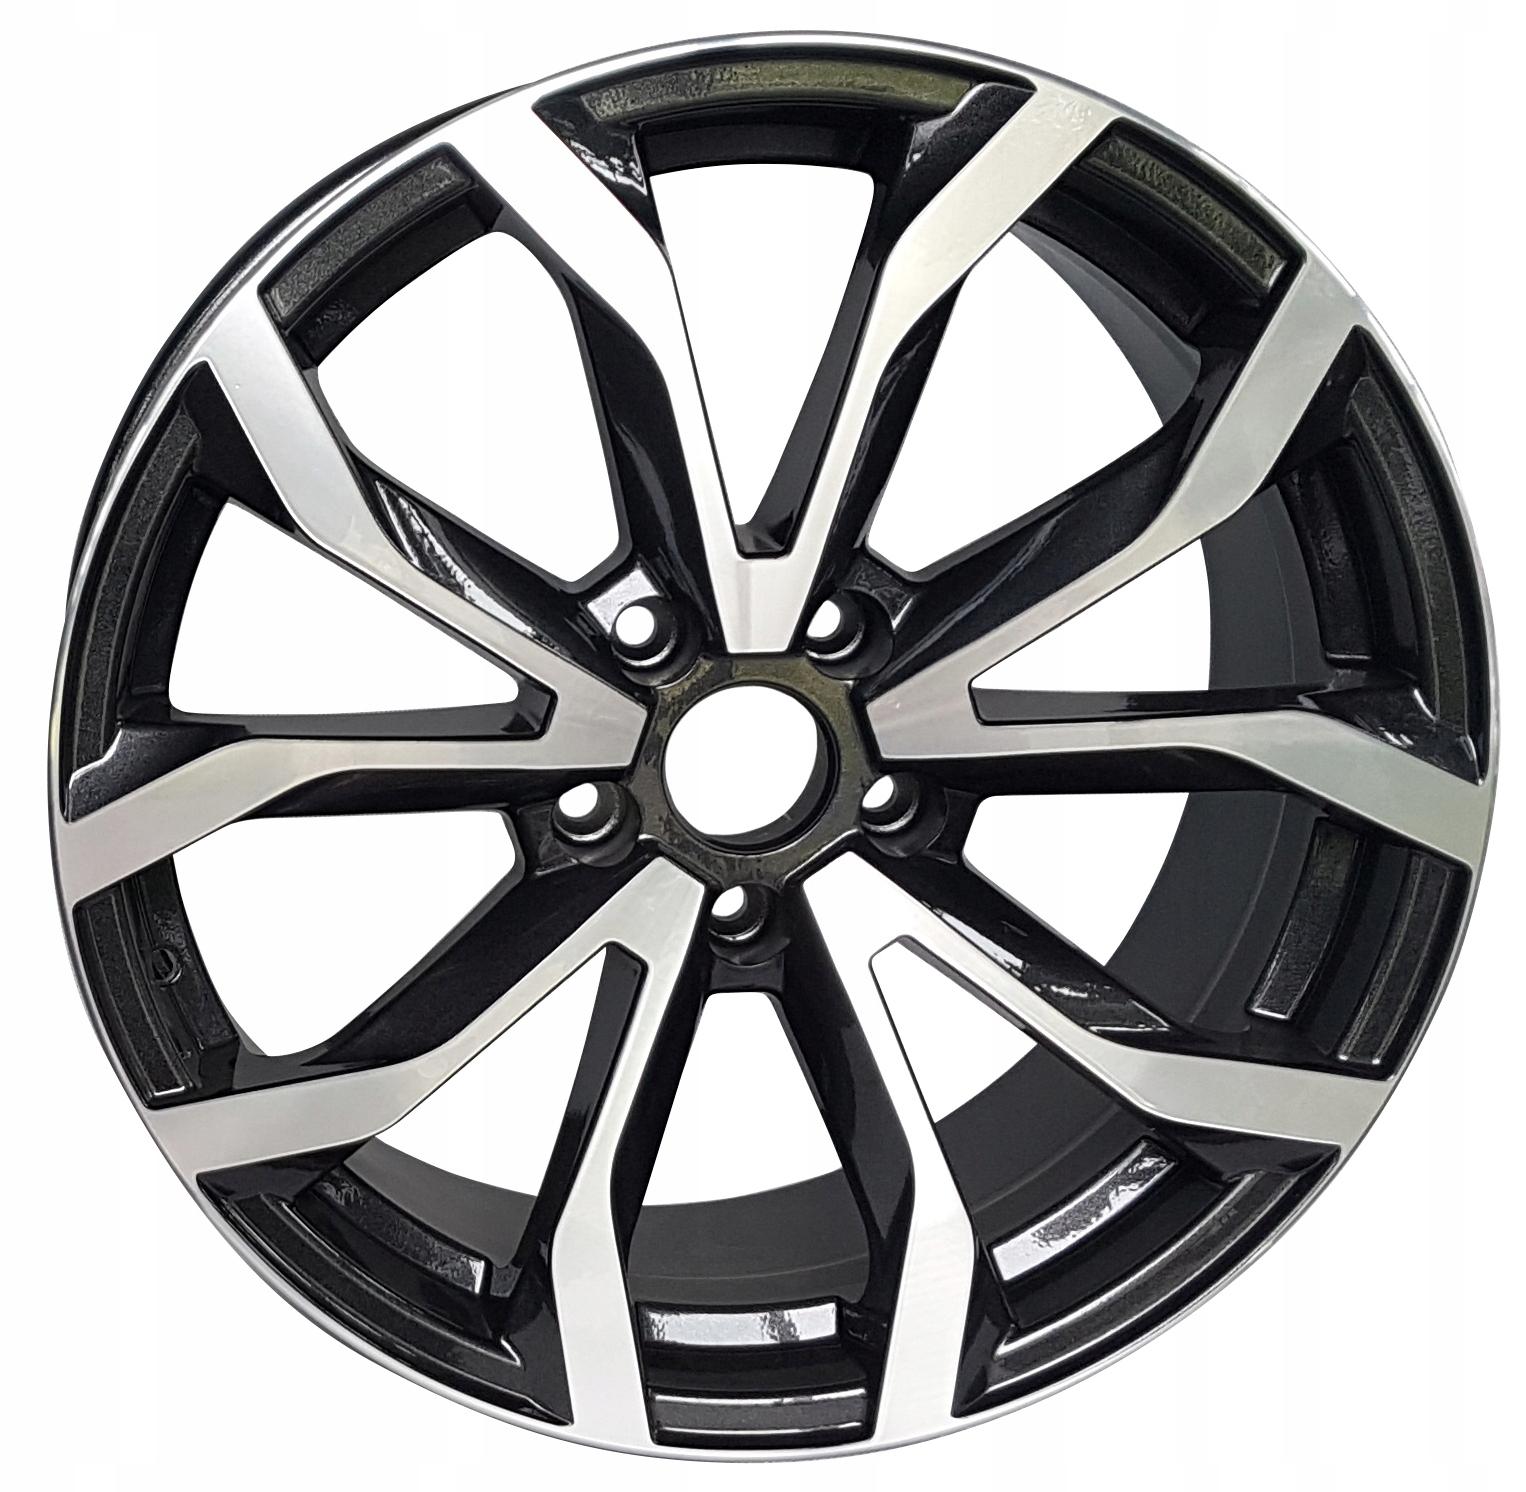 18 литые диски VW Passat B6 B7 B8 Arteon CC Scirocco